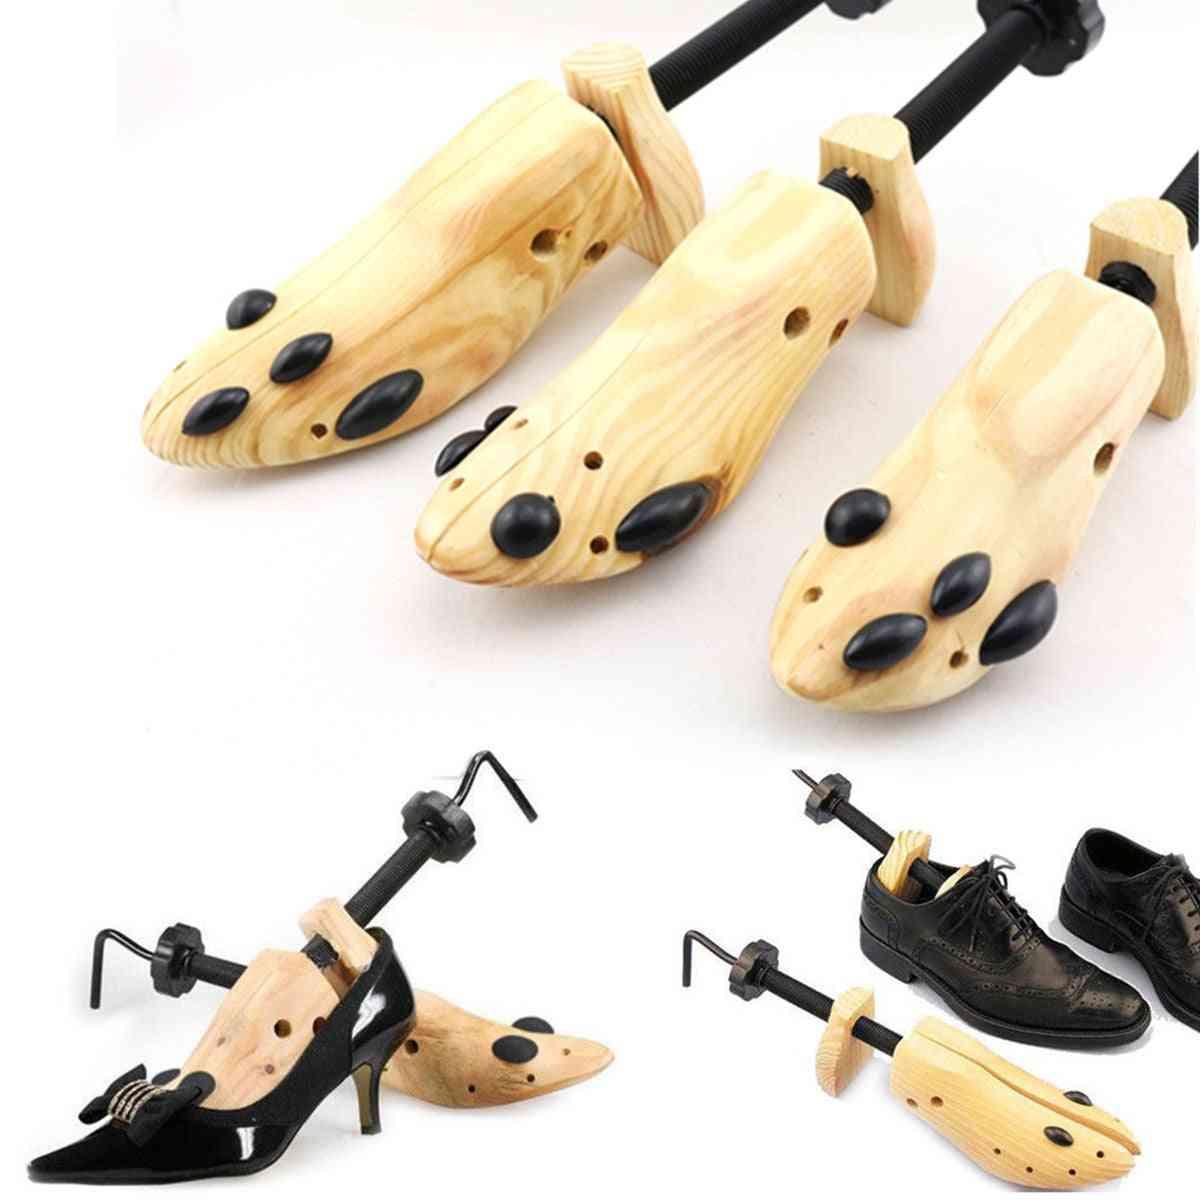 Tree Wood Shoes Stretcher, Adjustable Flats Pumps Boot Shaper